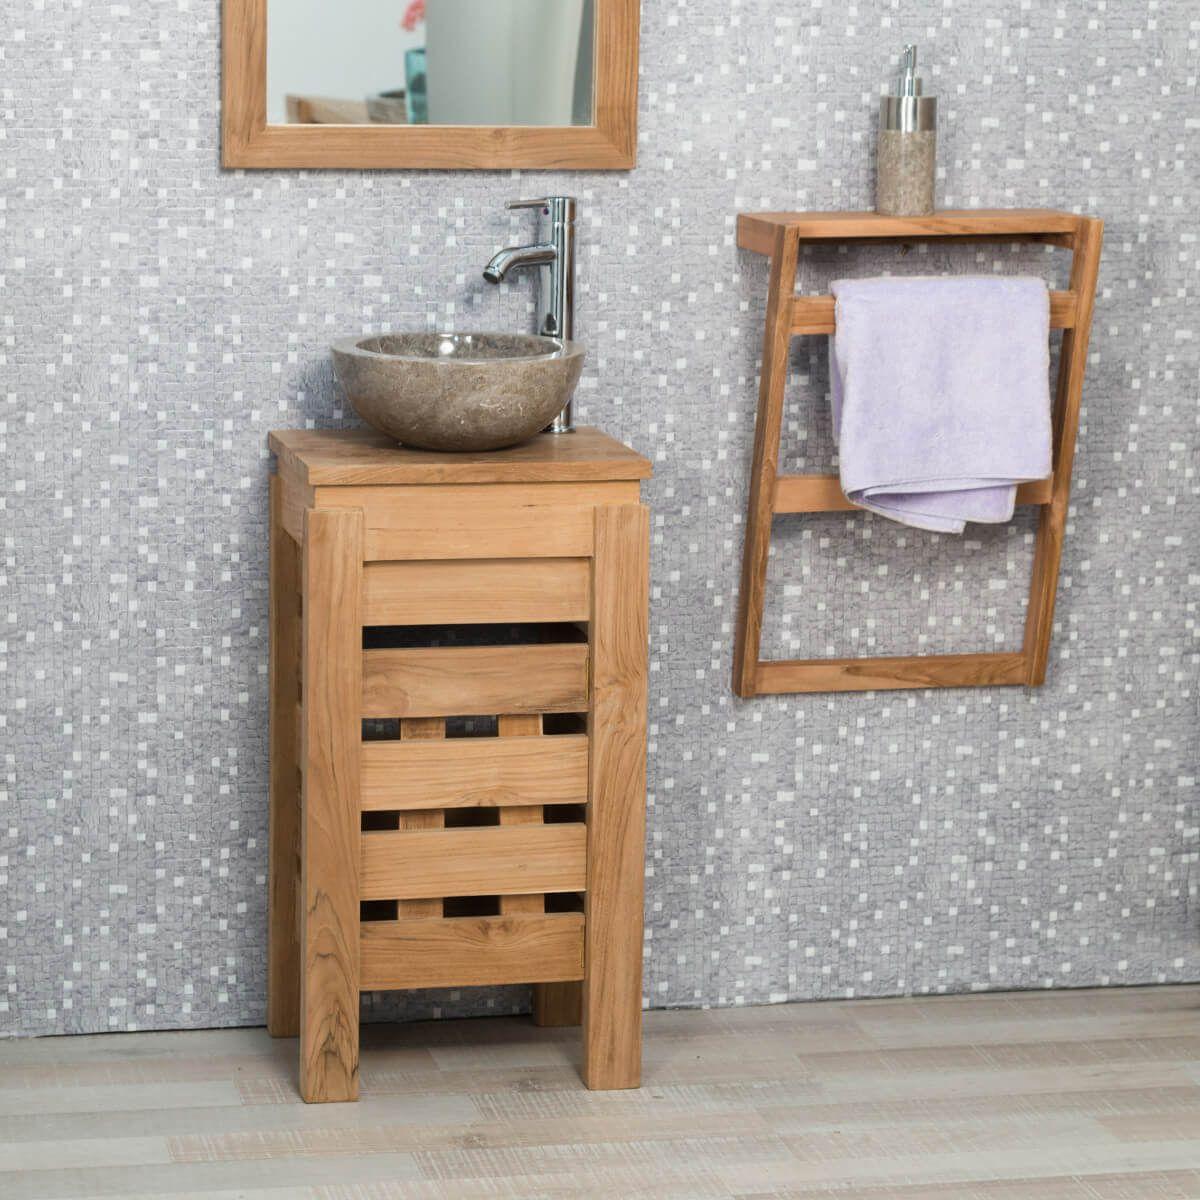 Petit meuble salle de bain wc zen en teck 40cm en 2020 Meuble wc design